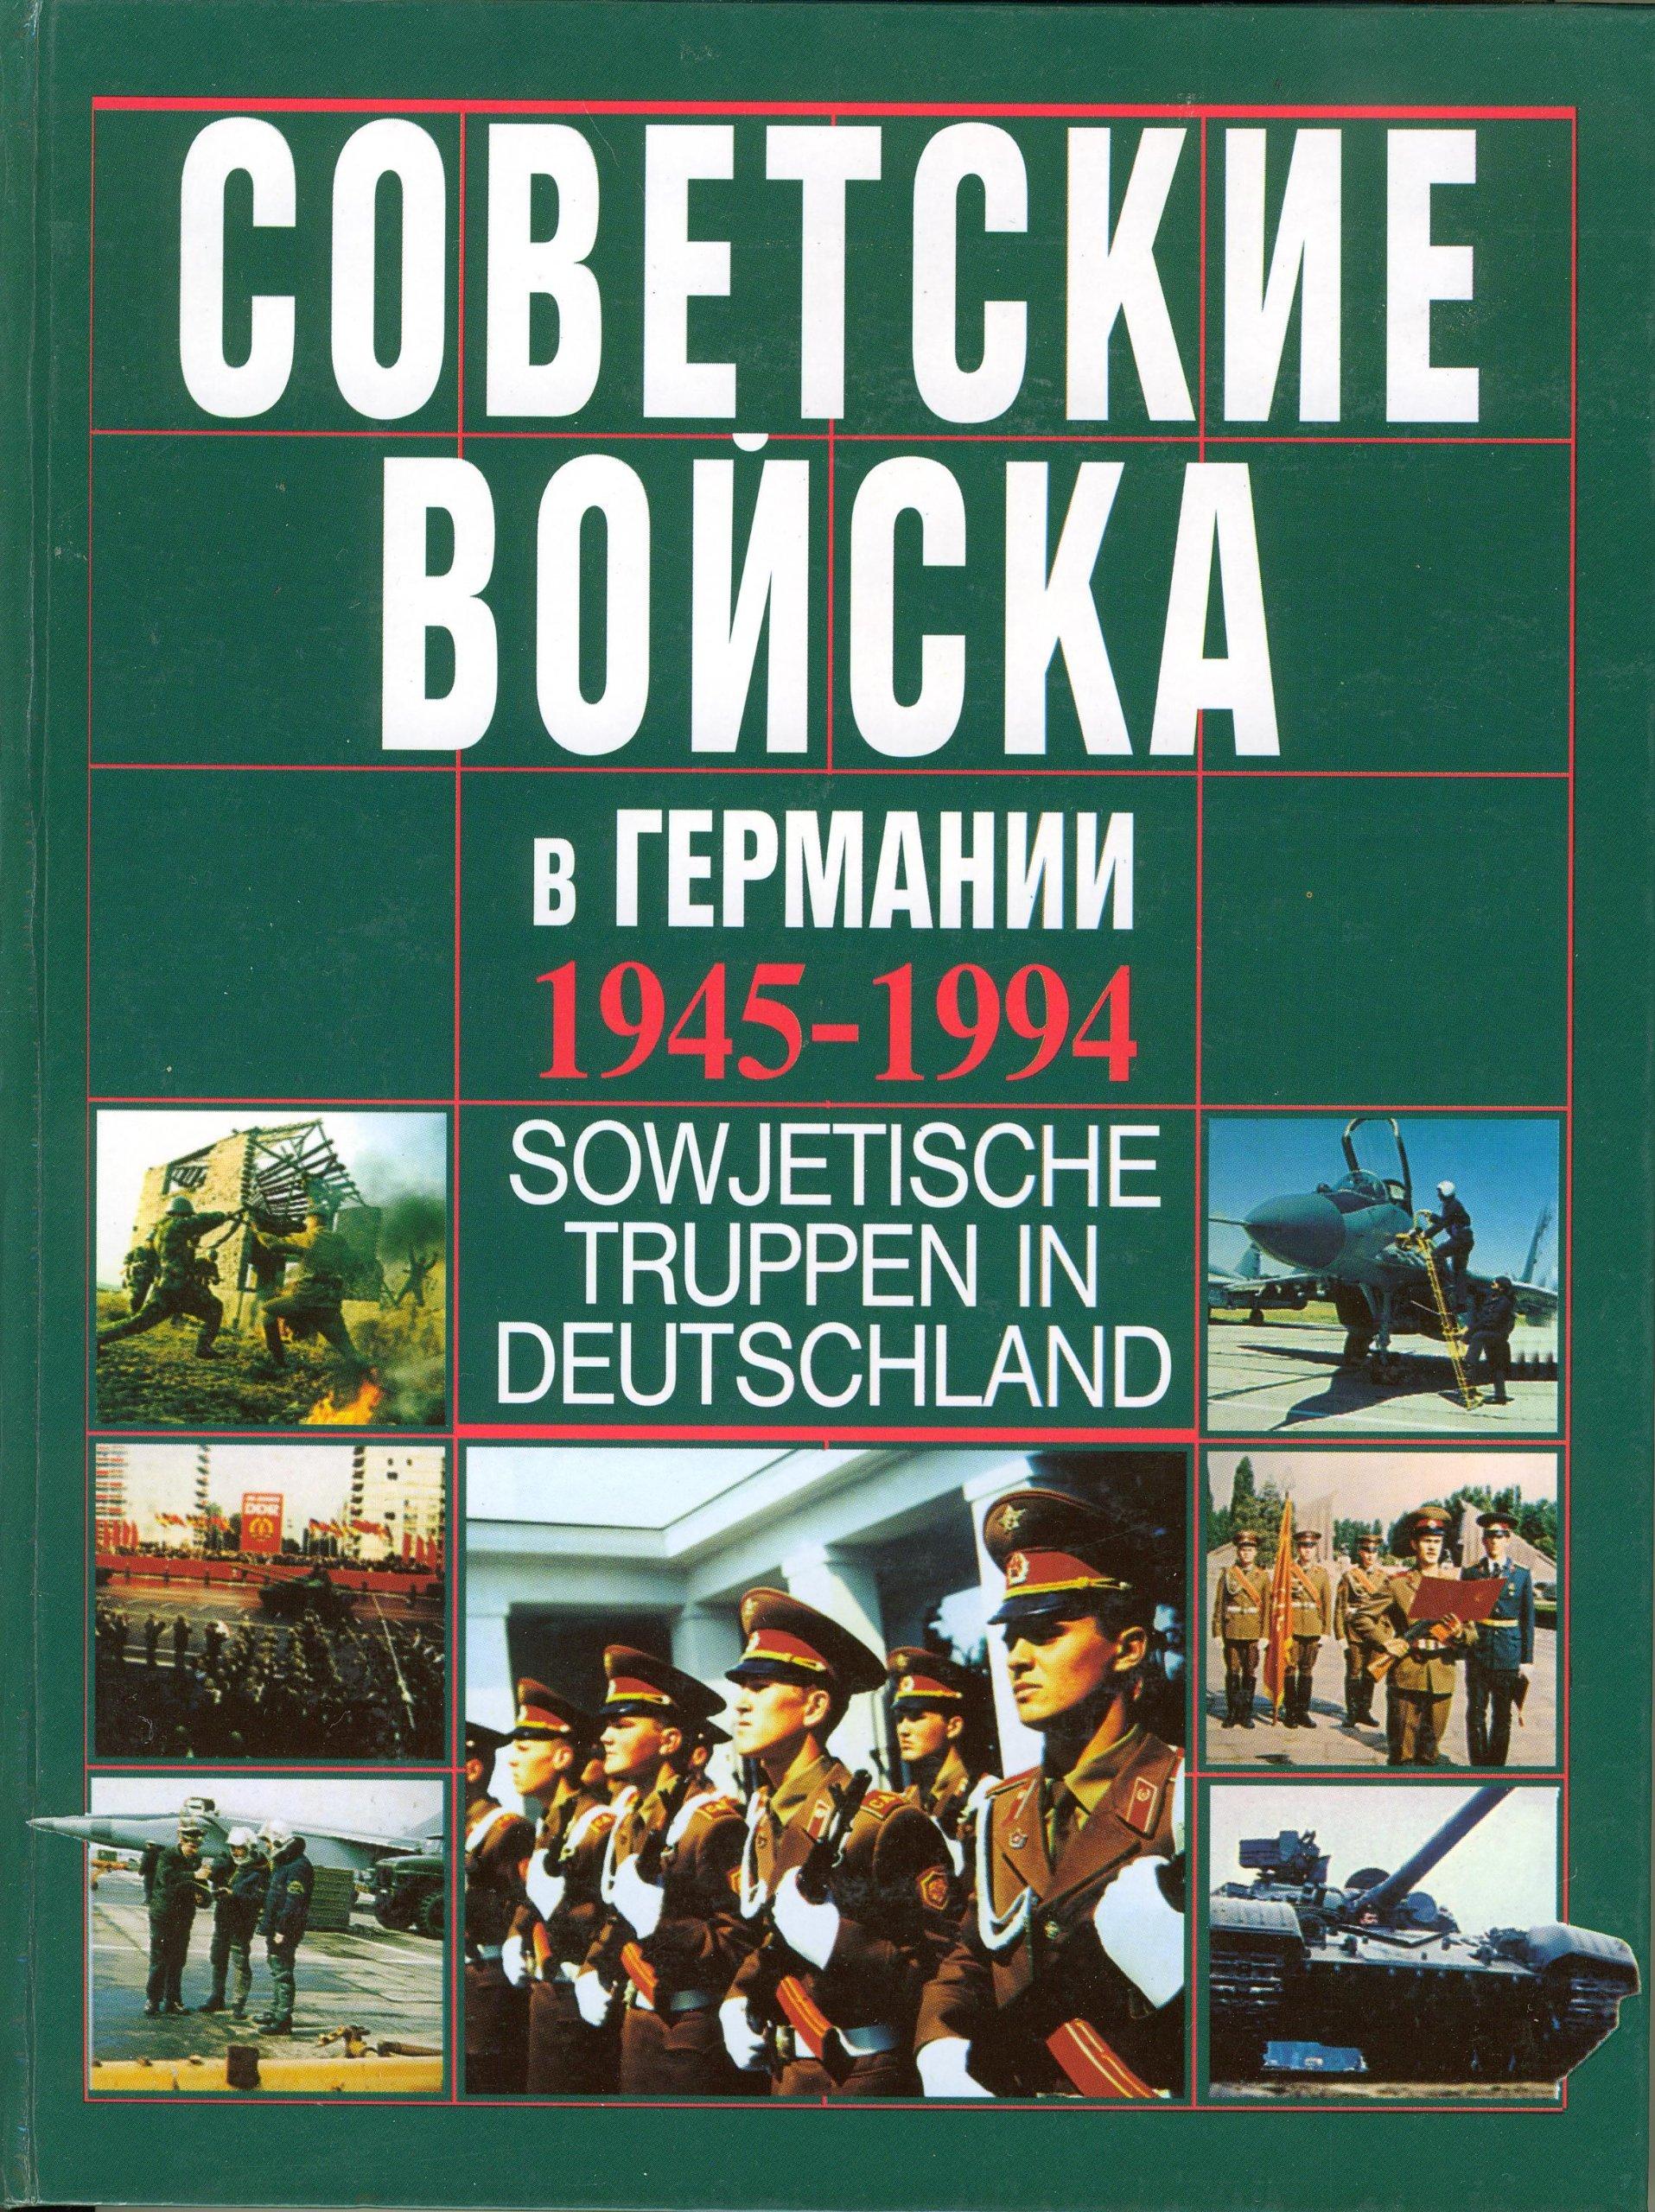 Sowjetische Truppen in Deutschland. 1945 - 1994 : Gedenkalbum